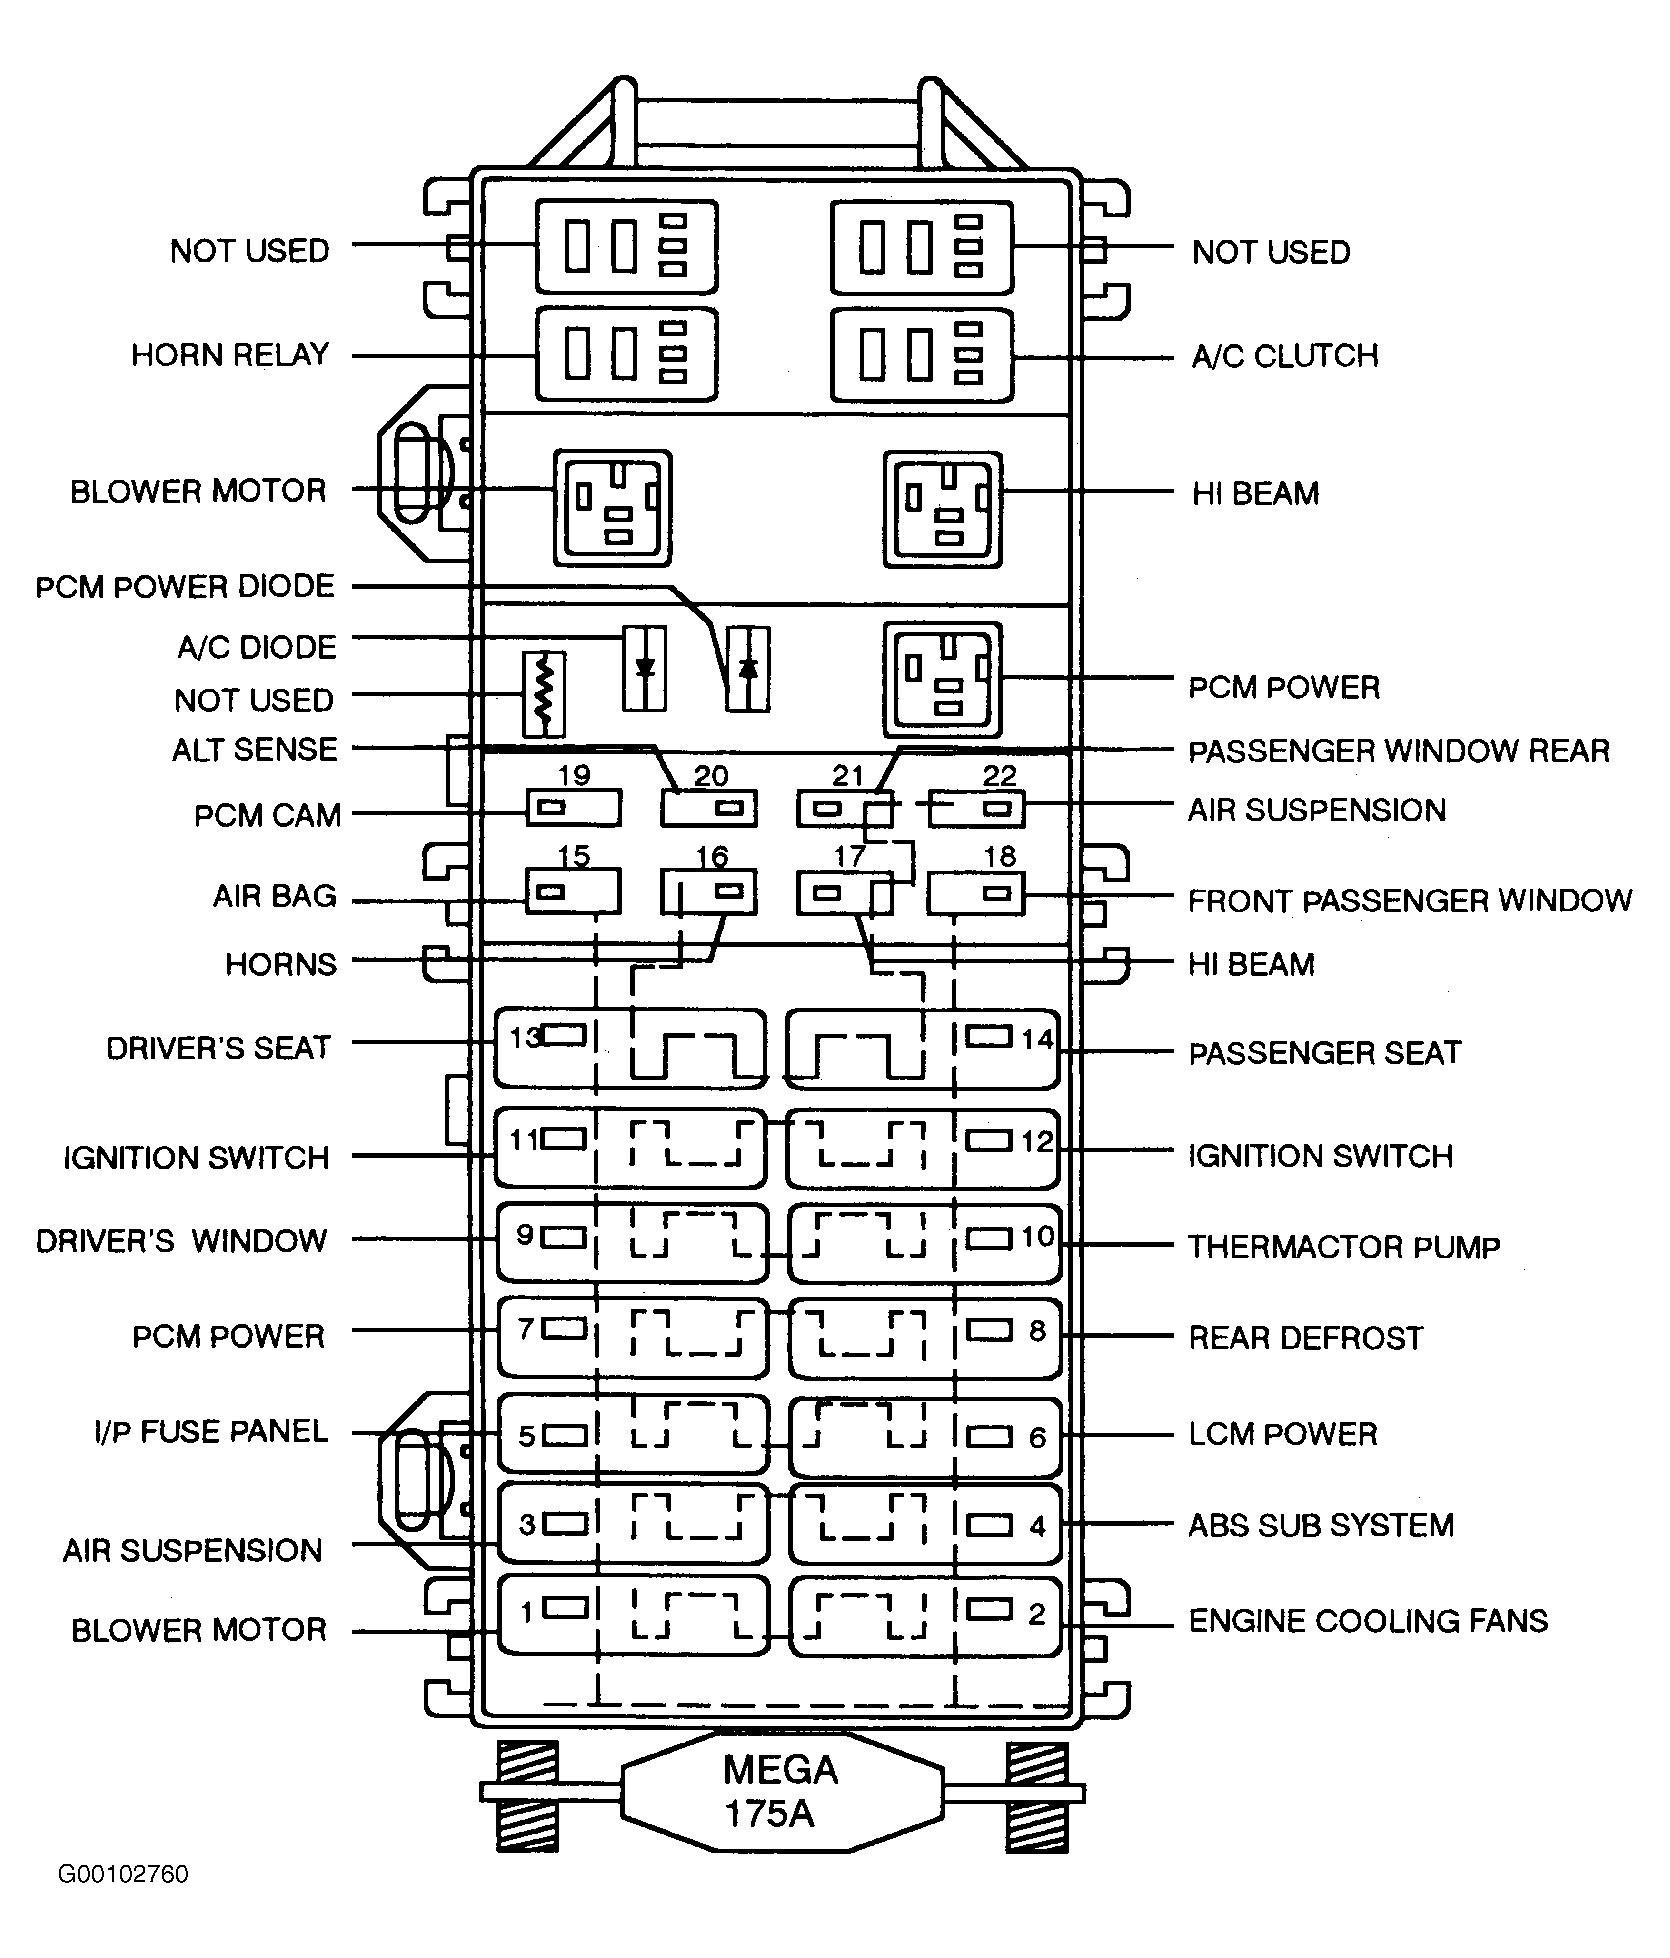 1999 lincoln town car engine diagram 1988 lincoln town car fuse panel diagram off anggun tintenglueck de  1988 lincoln town car fuse panel